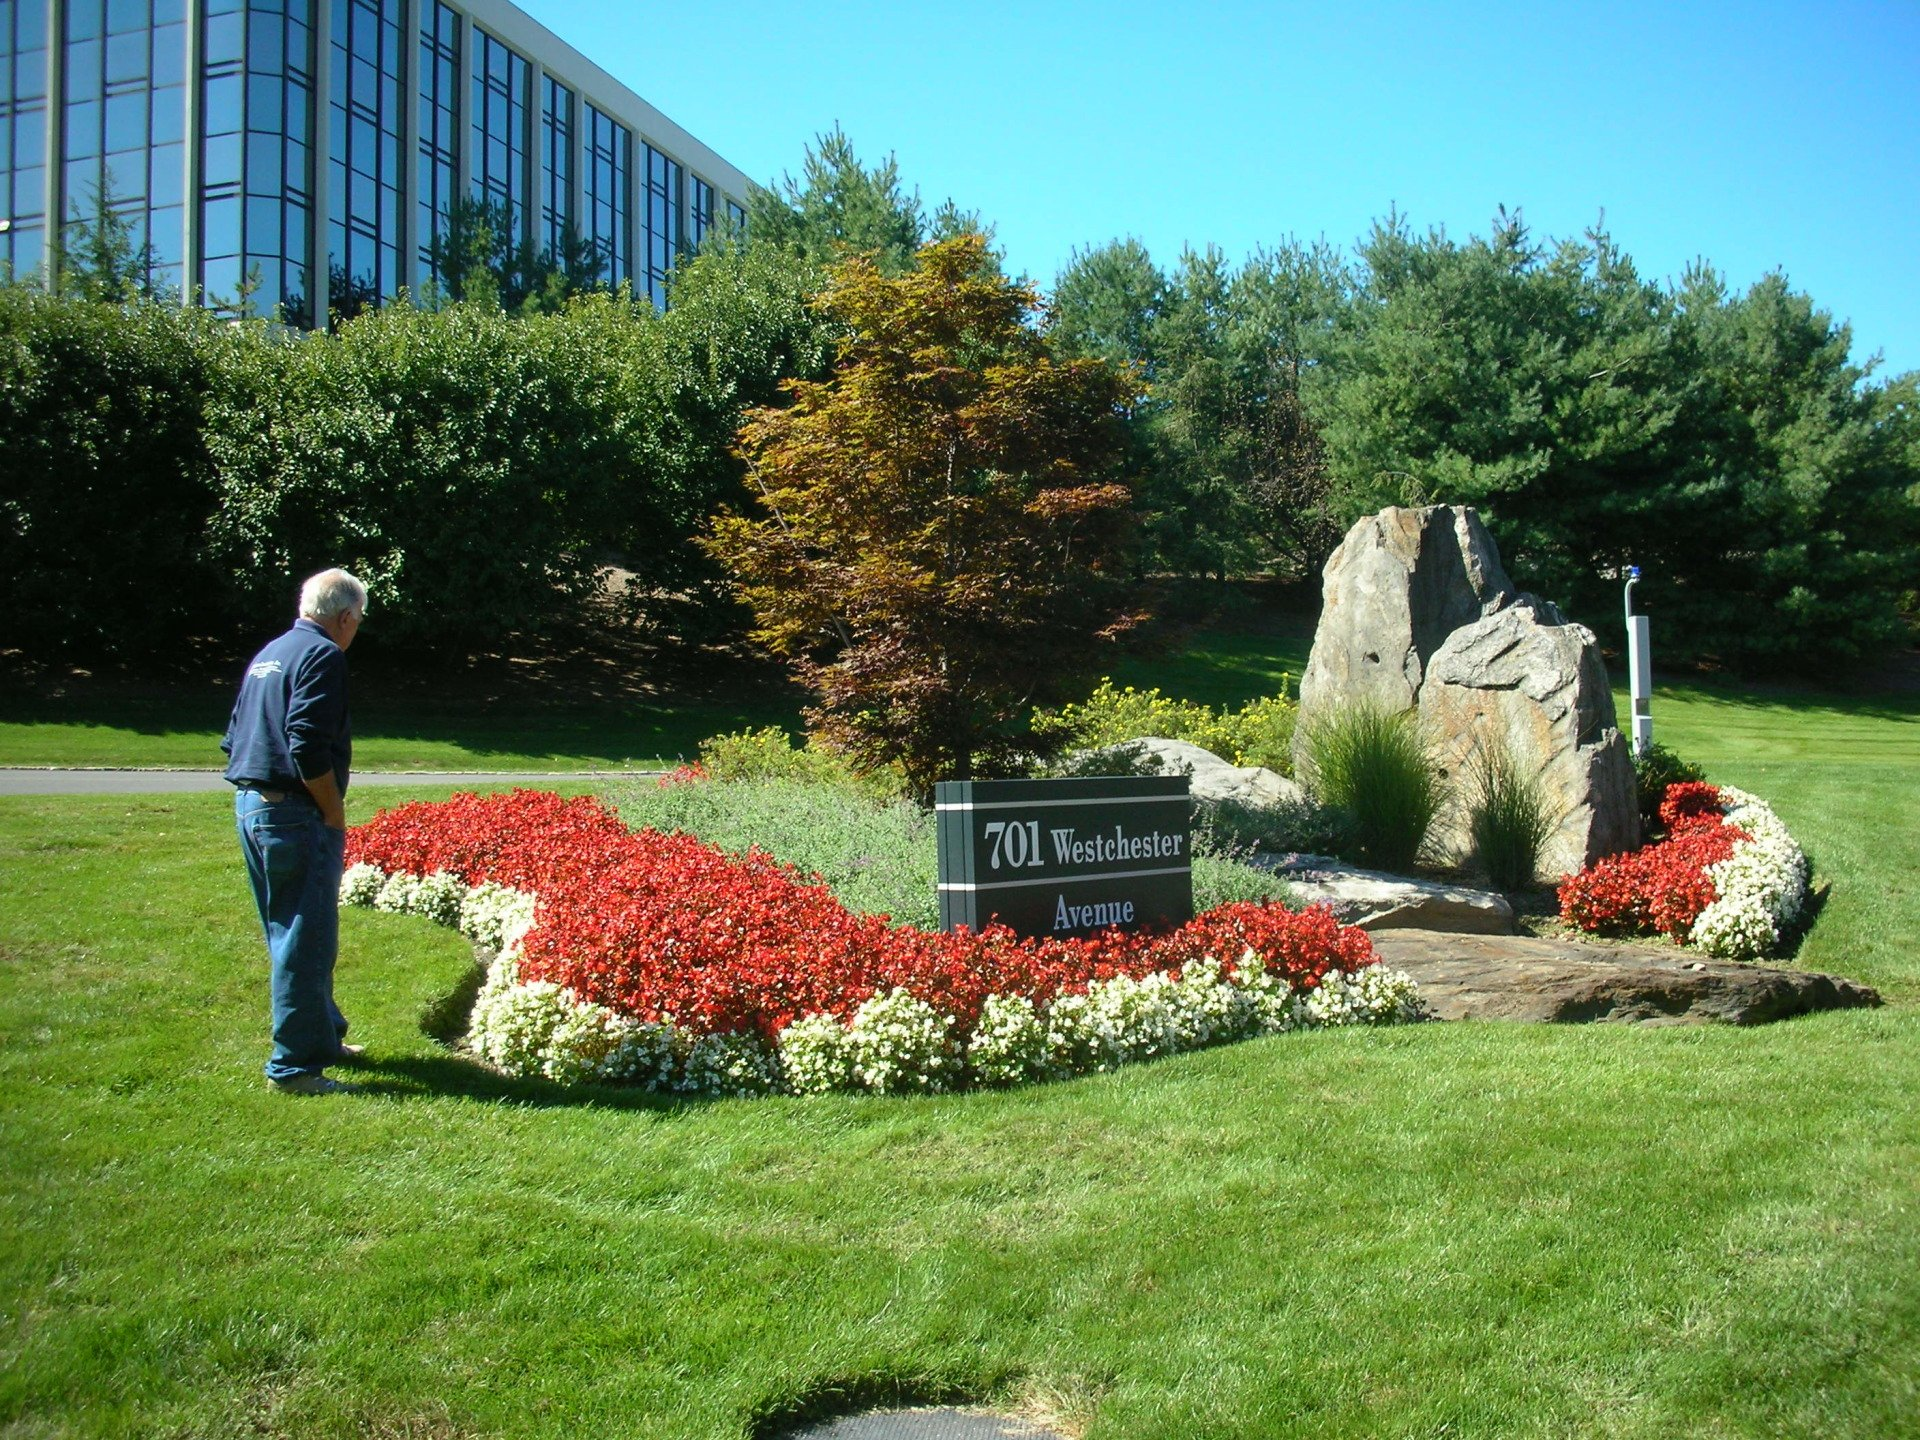 Landscaping Bedford Hills Ny Palotta Landscaping